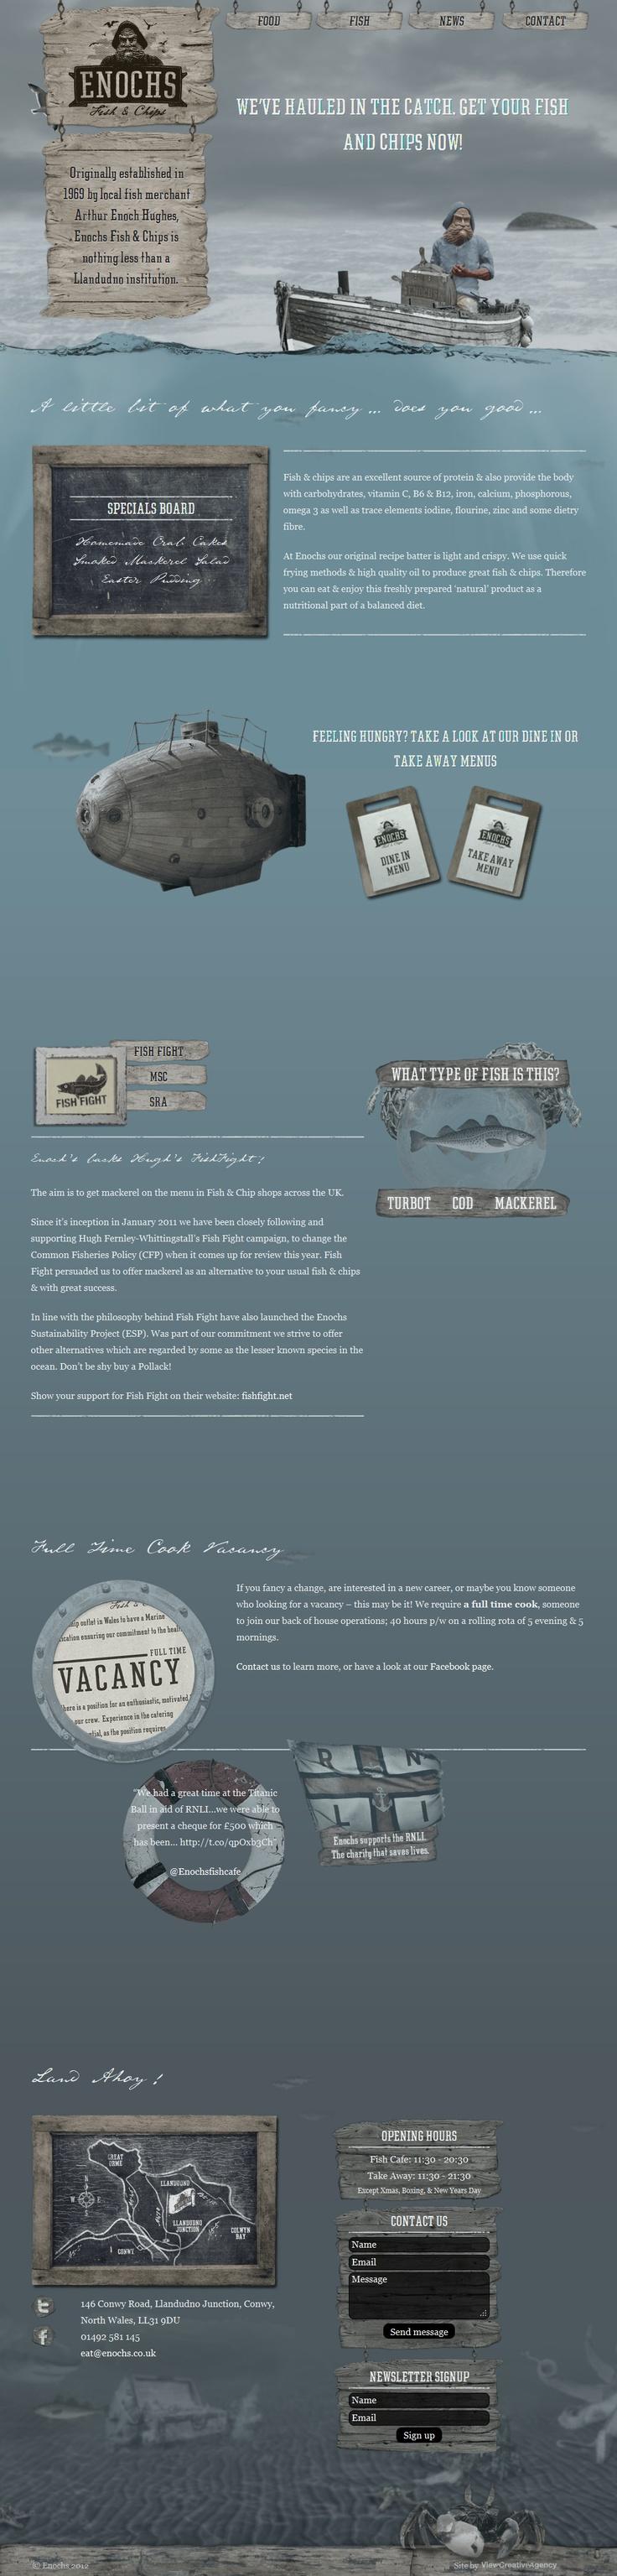 Unique Web Design, Enochs Fish  Chips #webdesign #design (http://www.pinterest.com/aldenchong/)